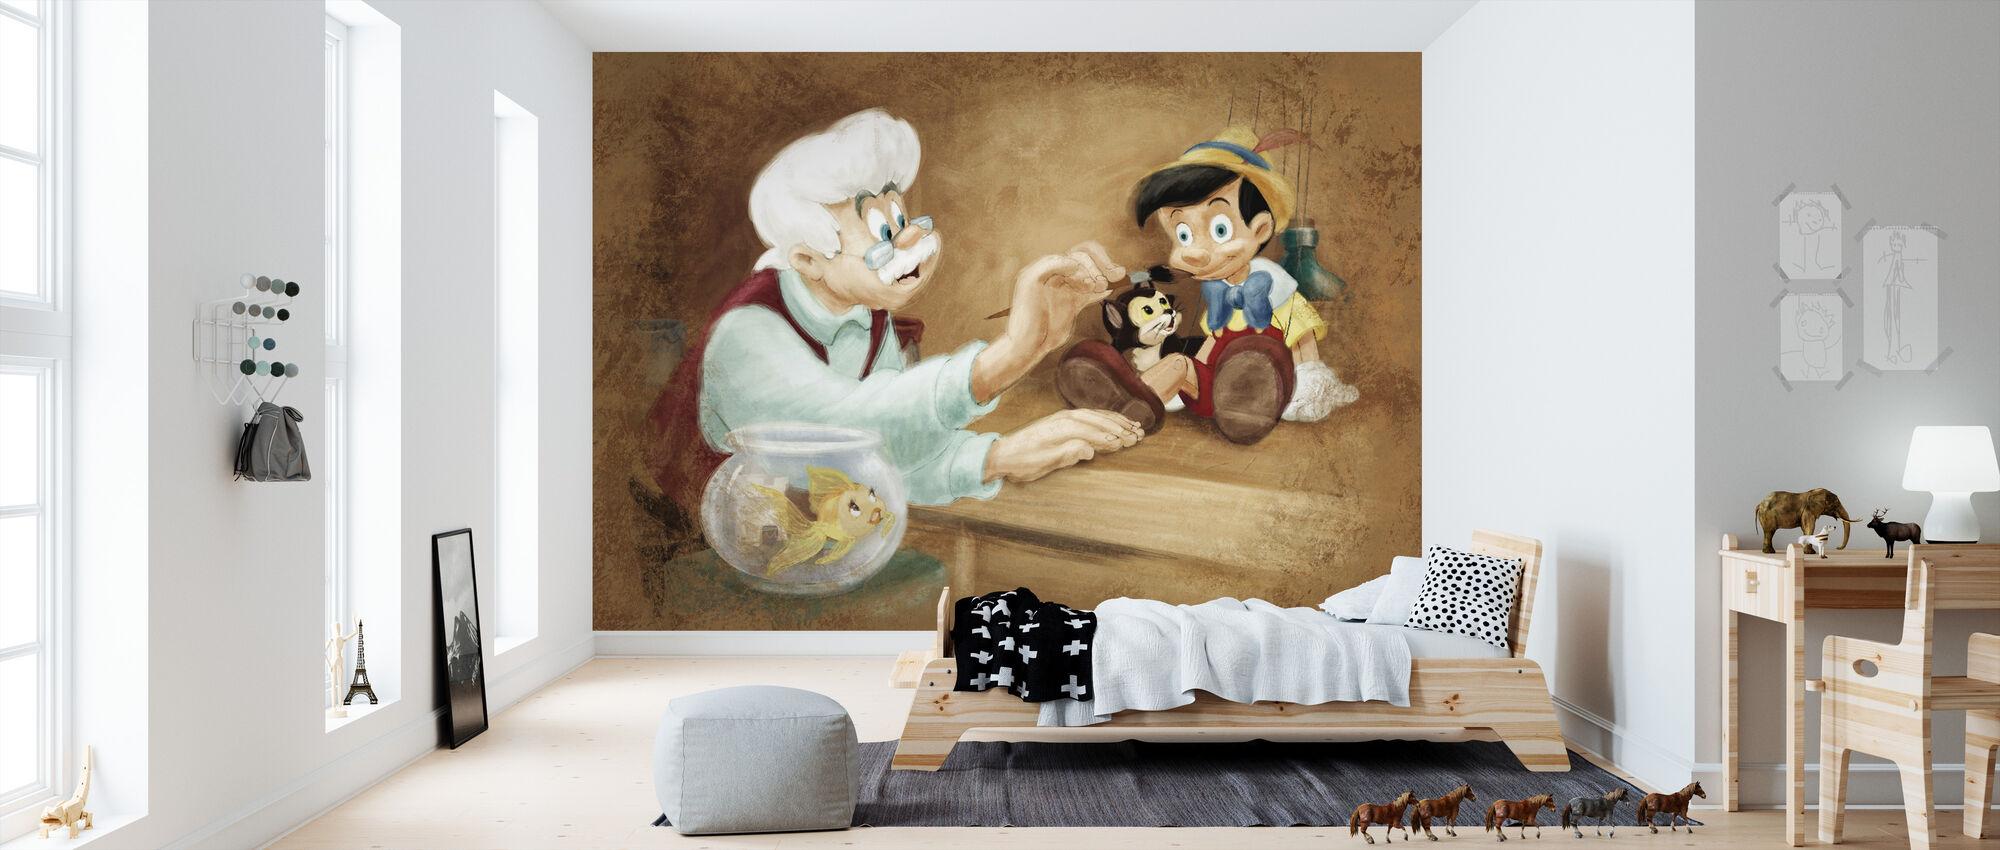 Disney-klassiker - Pinocchio - Tapet - Barnrum